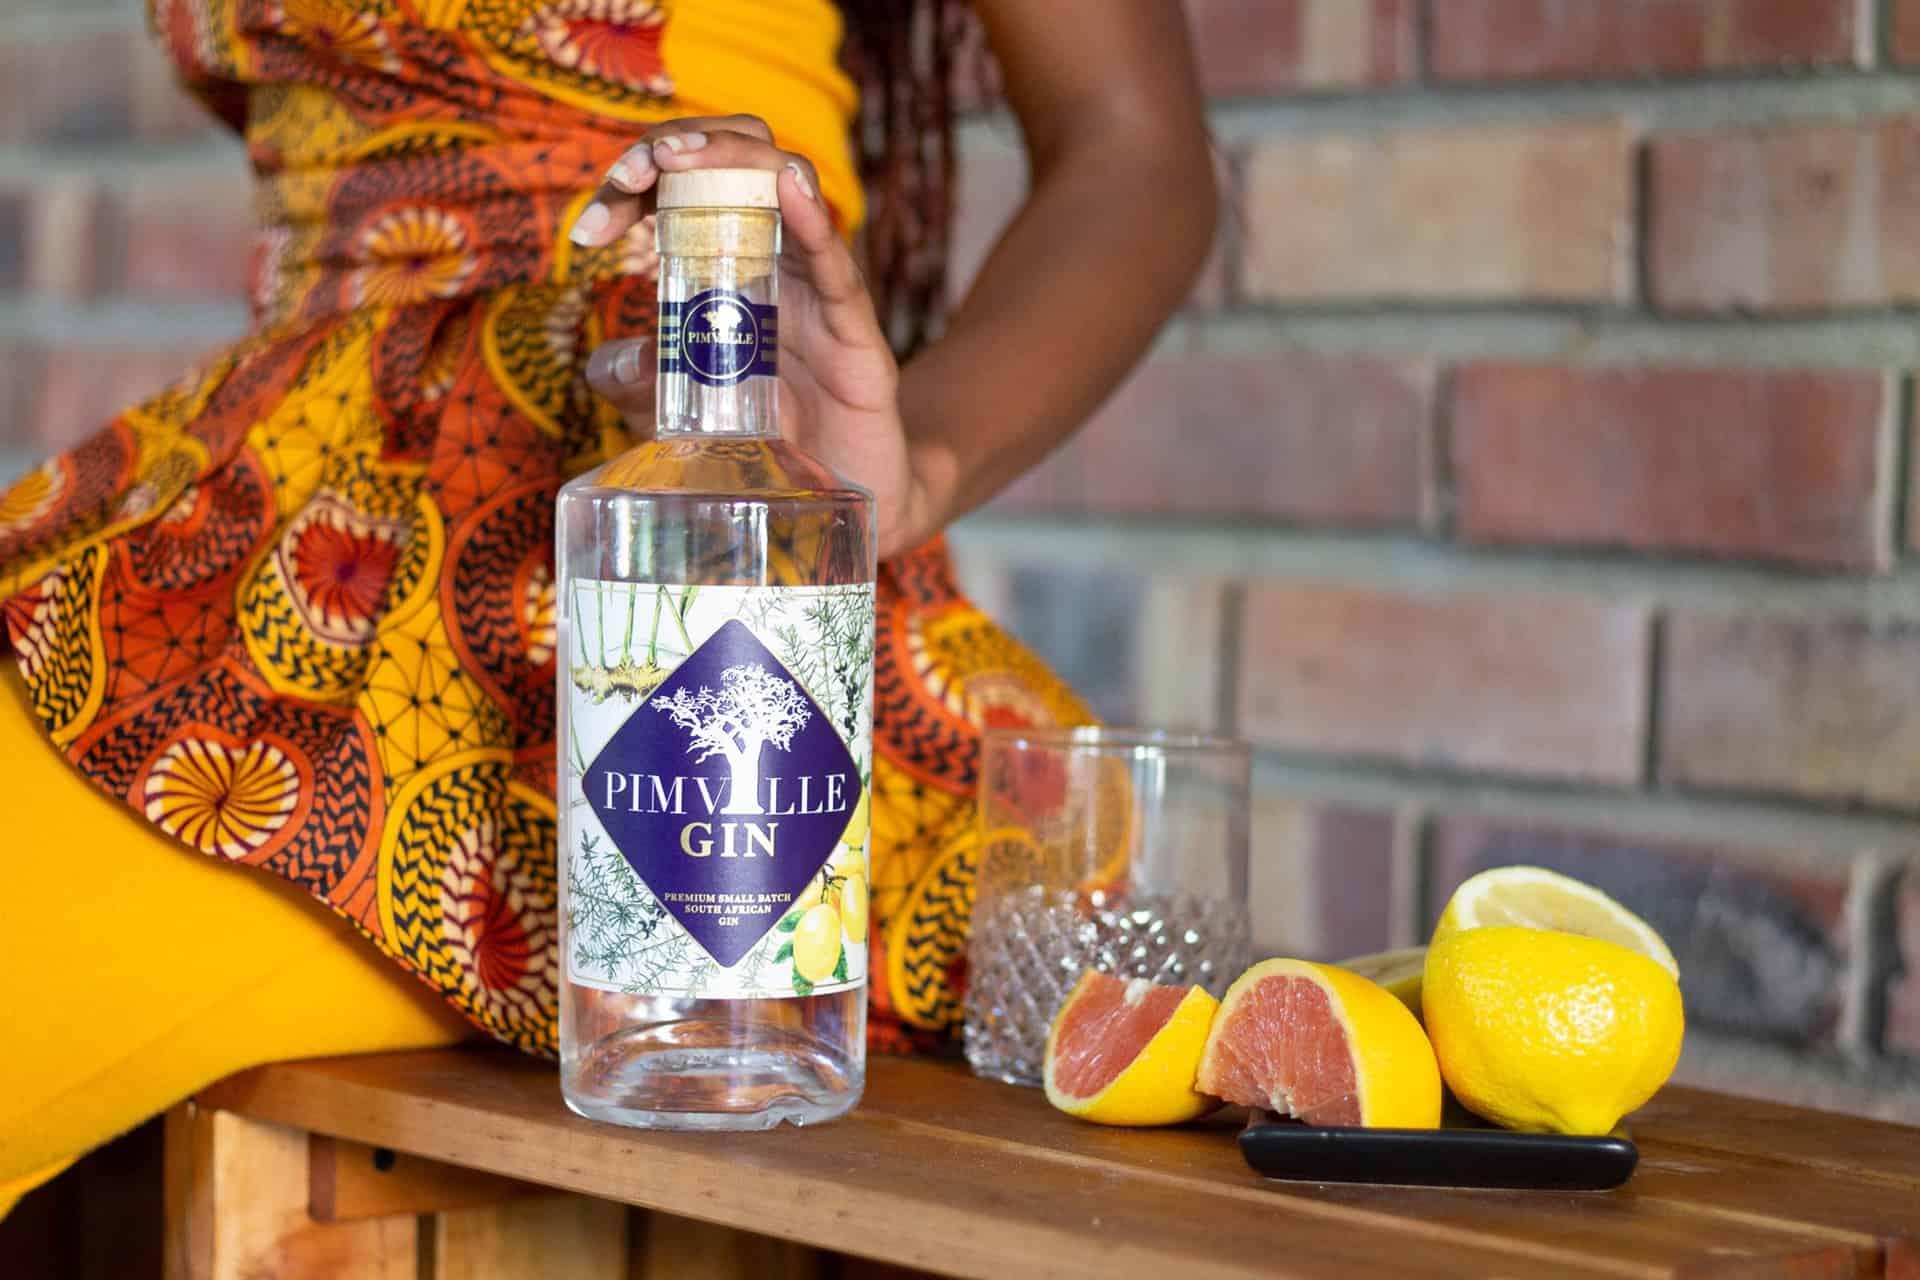 Pimville Gin   Premier quality Gin